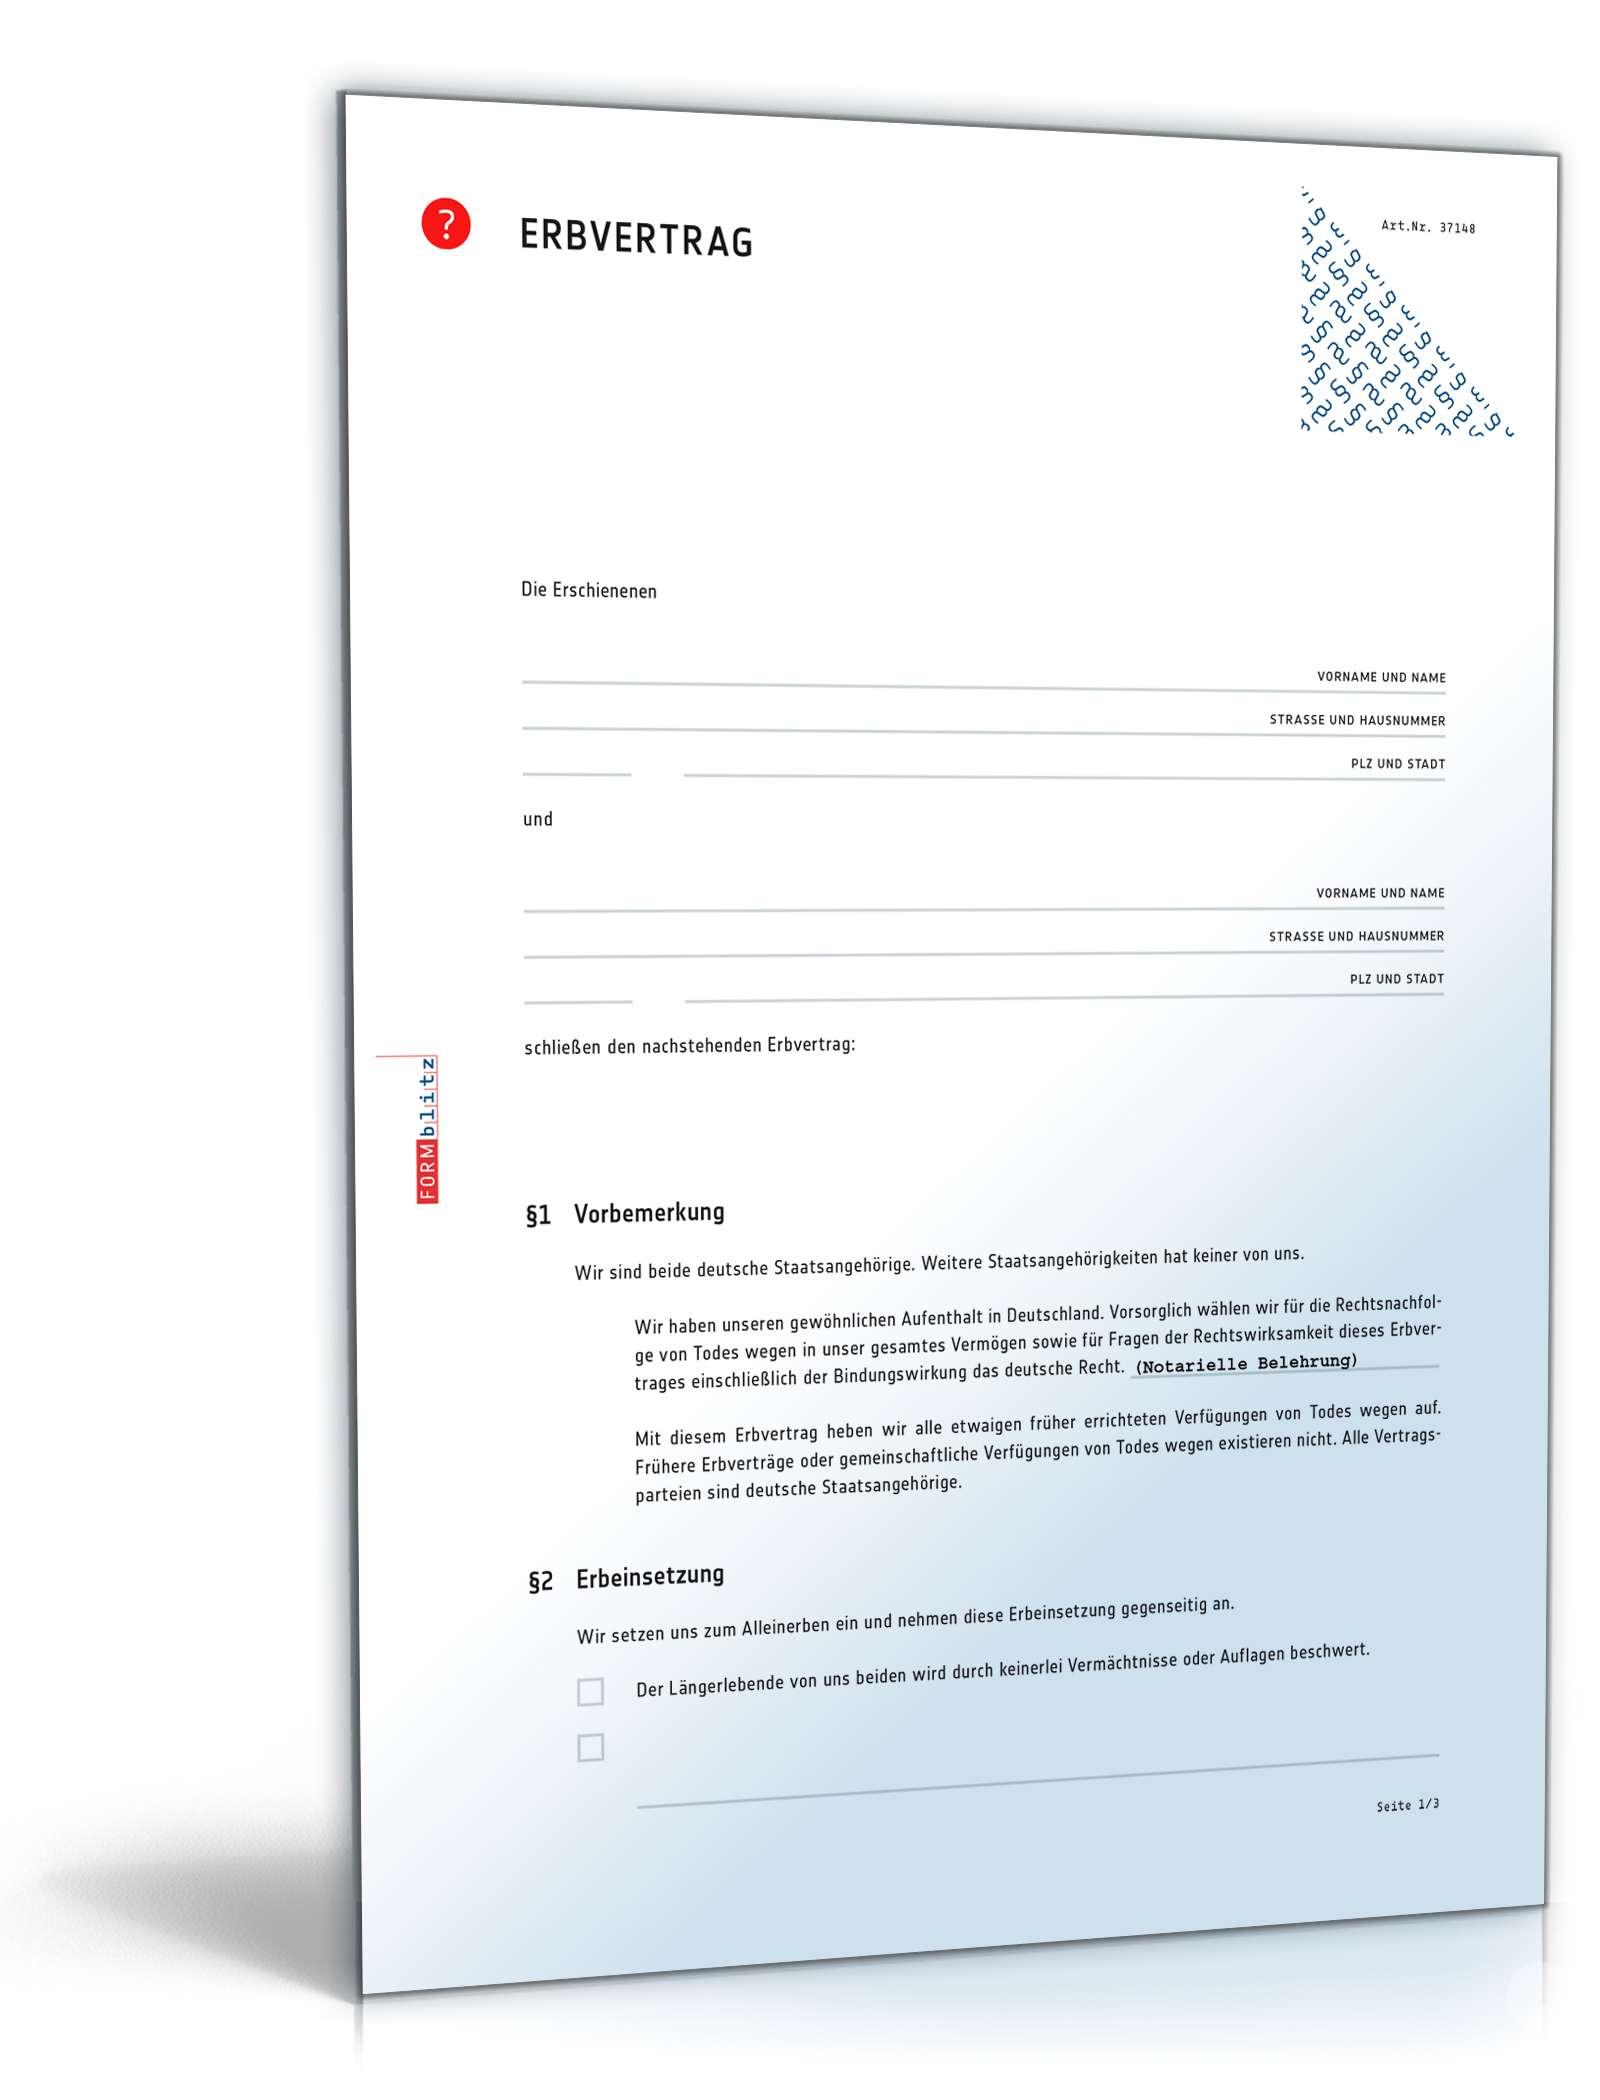 erbvertrag download rechtssicheres muster zur nachlassregelung - Erbvertrag Muster